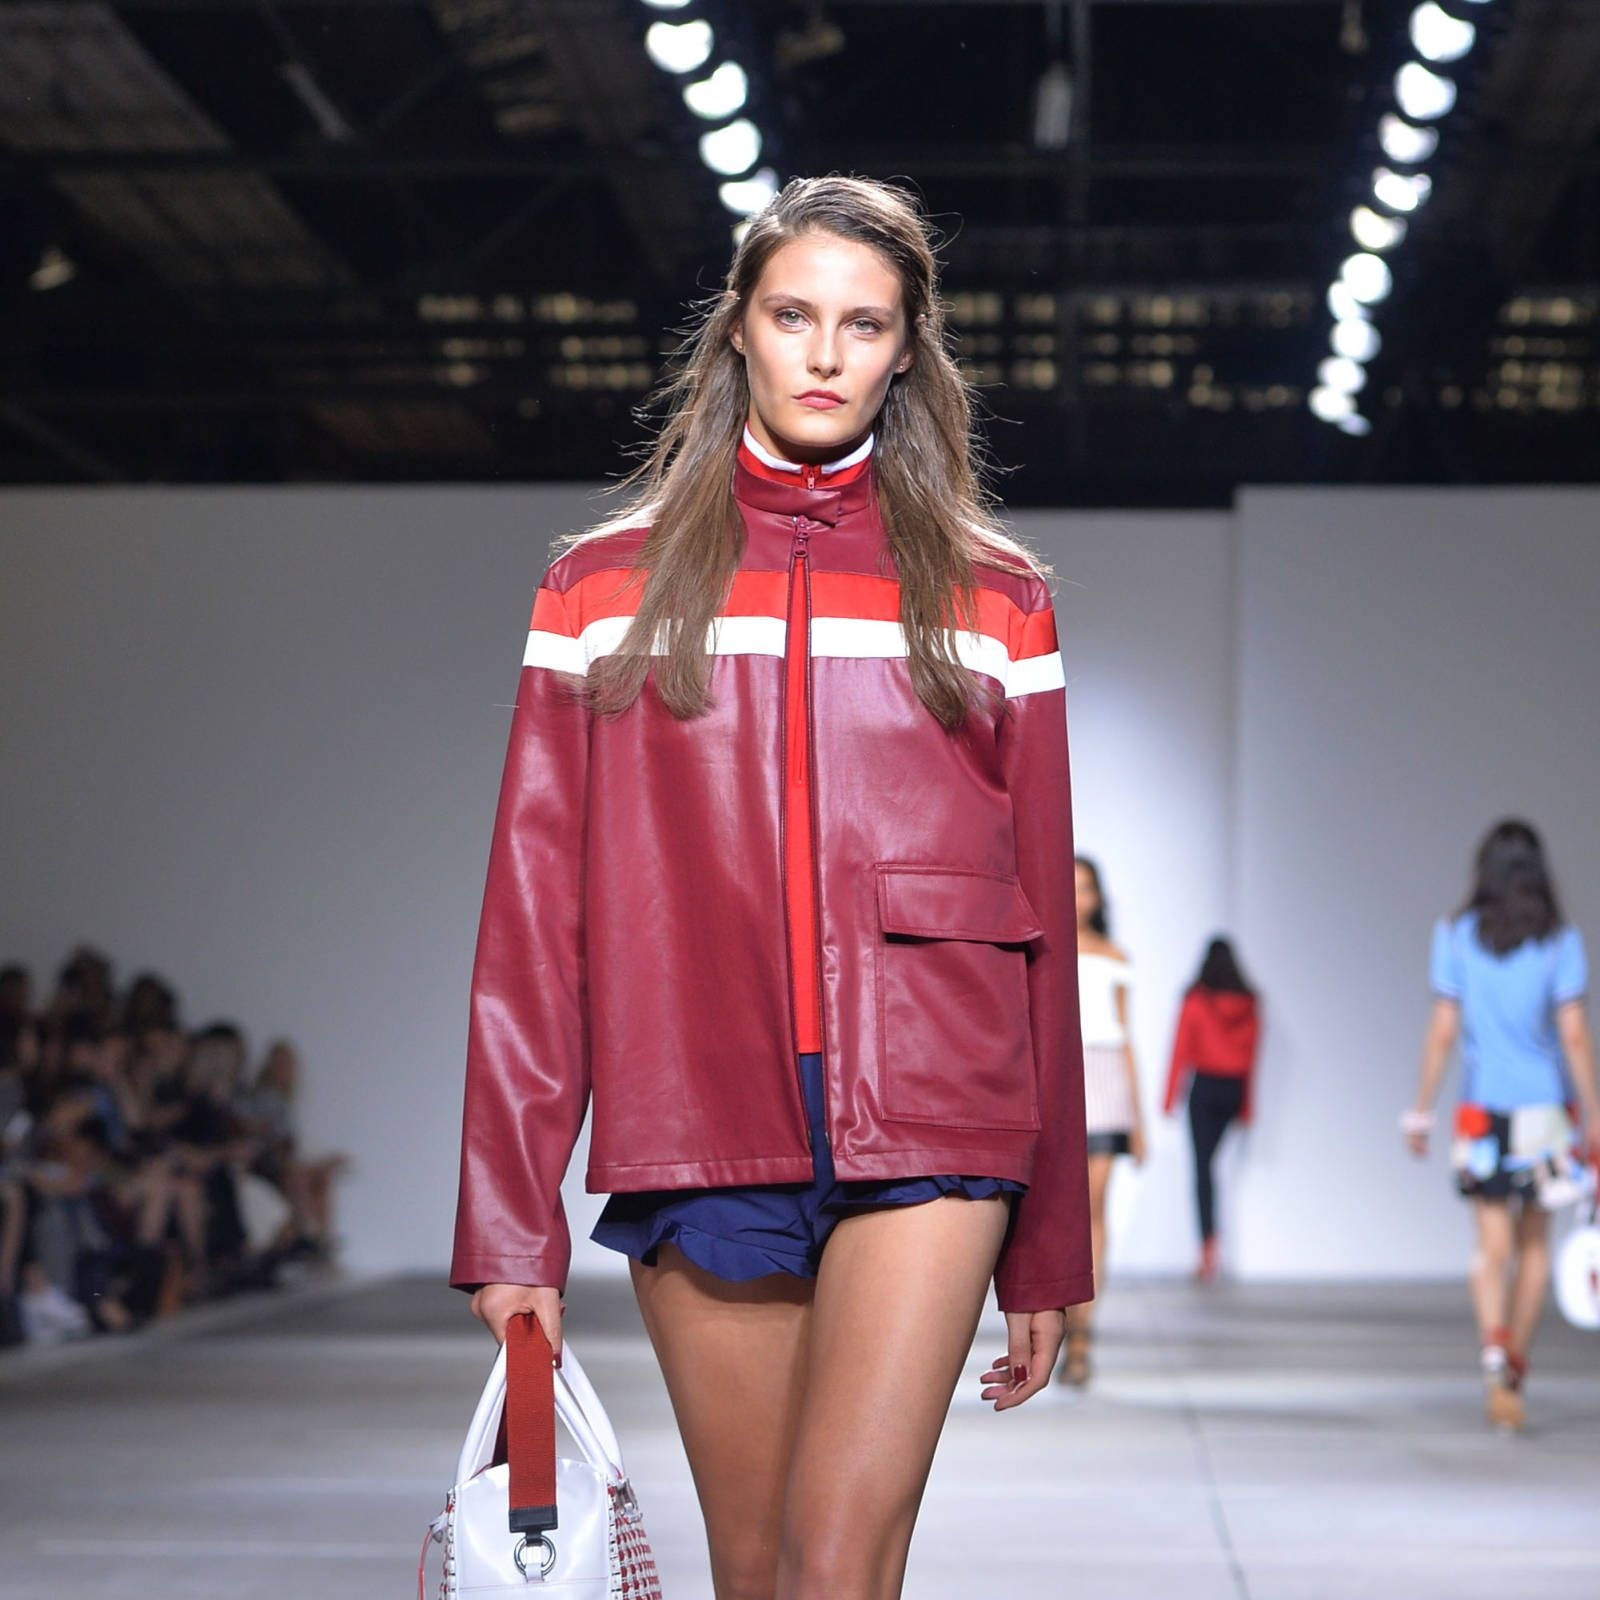 London Fashion Week: Topshop Unique SS15